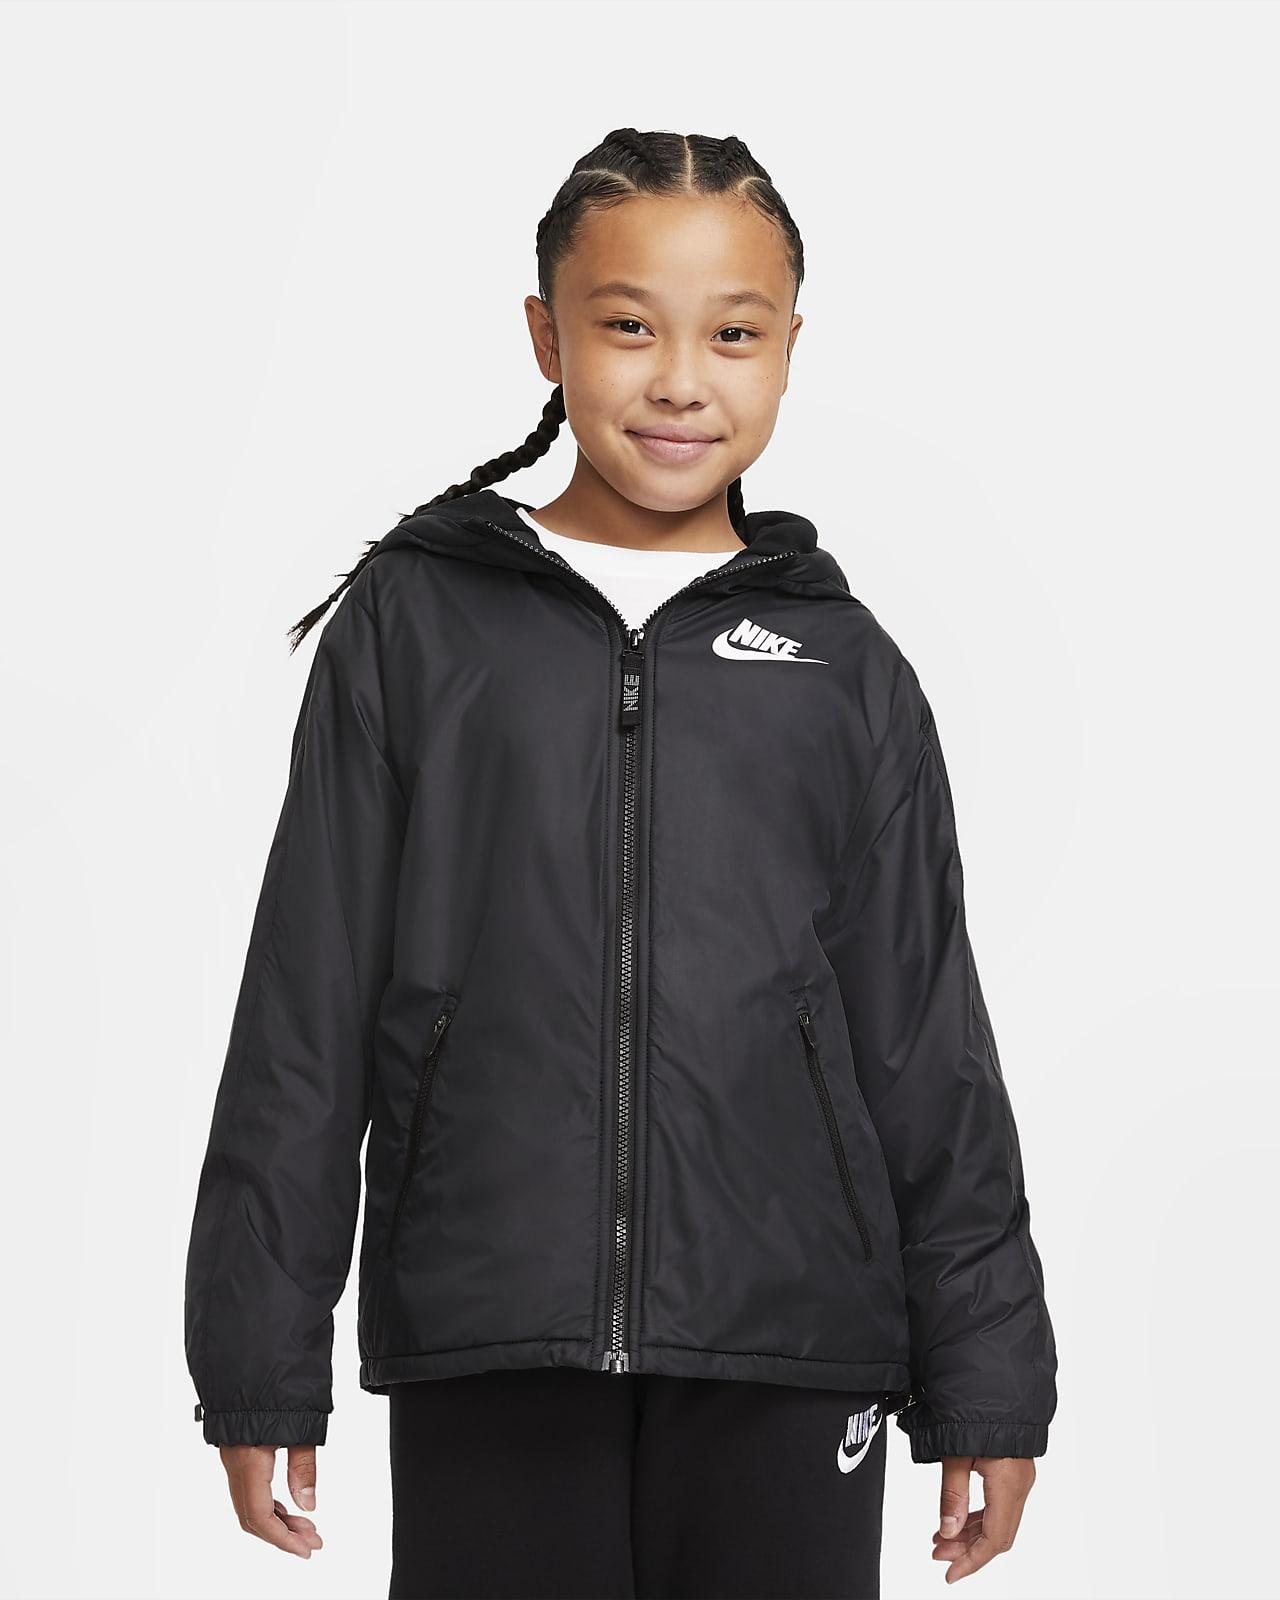 Nike Sportswear Chaqueta con forro de tejido Fleece - Niño/a